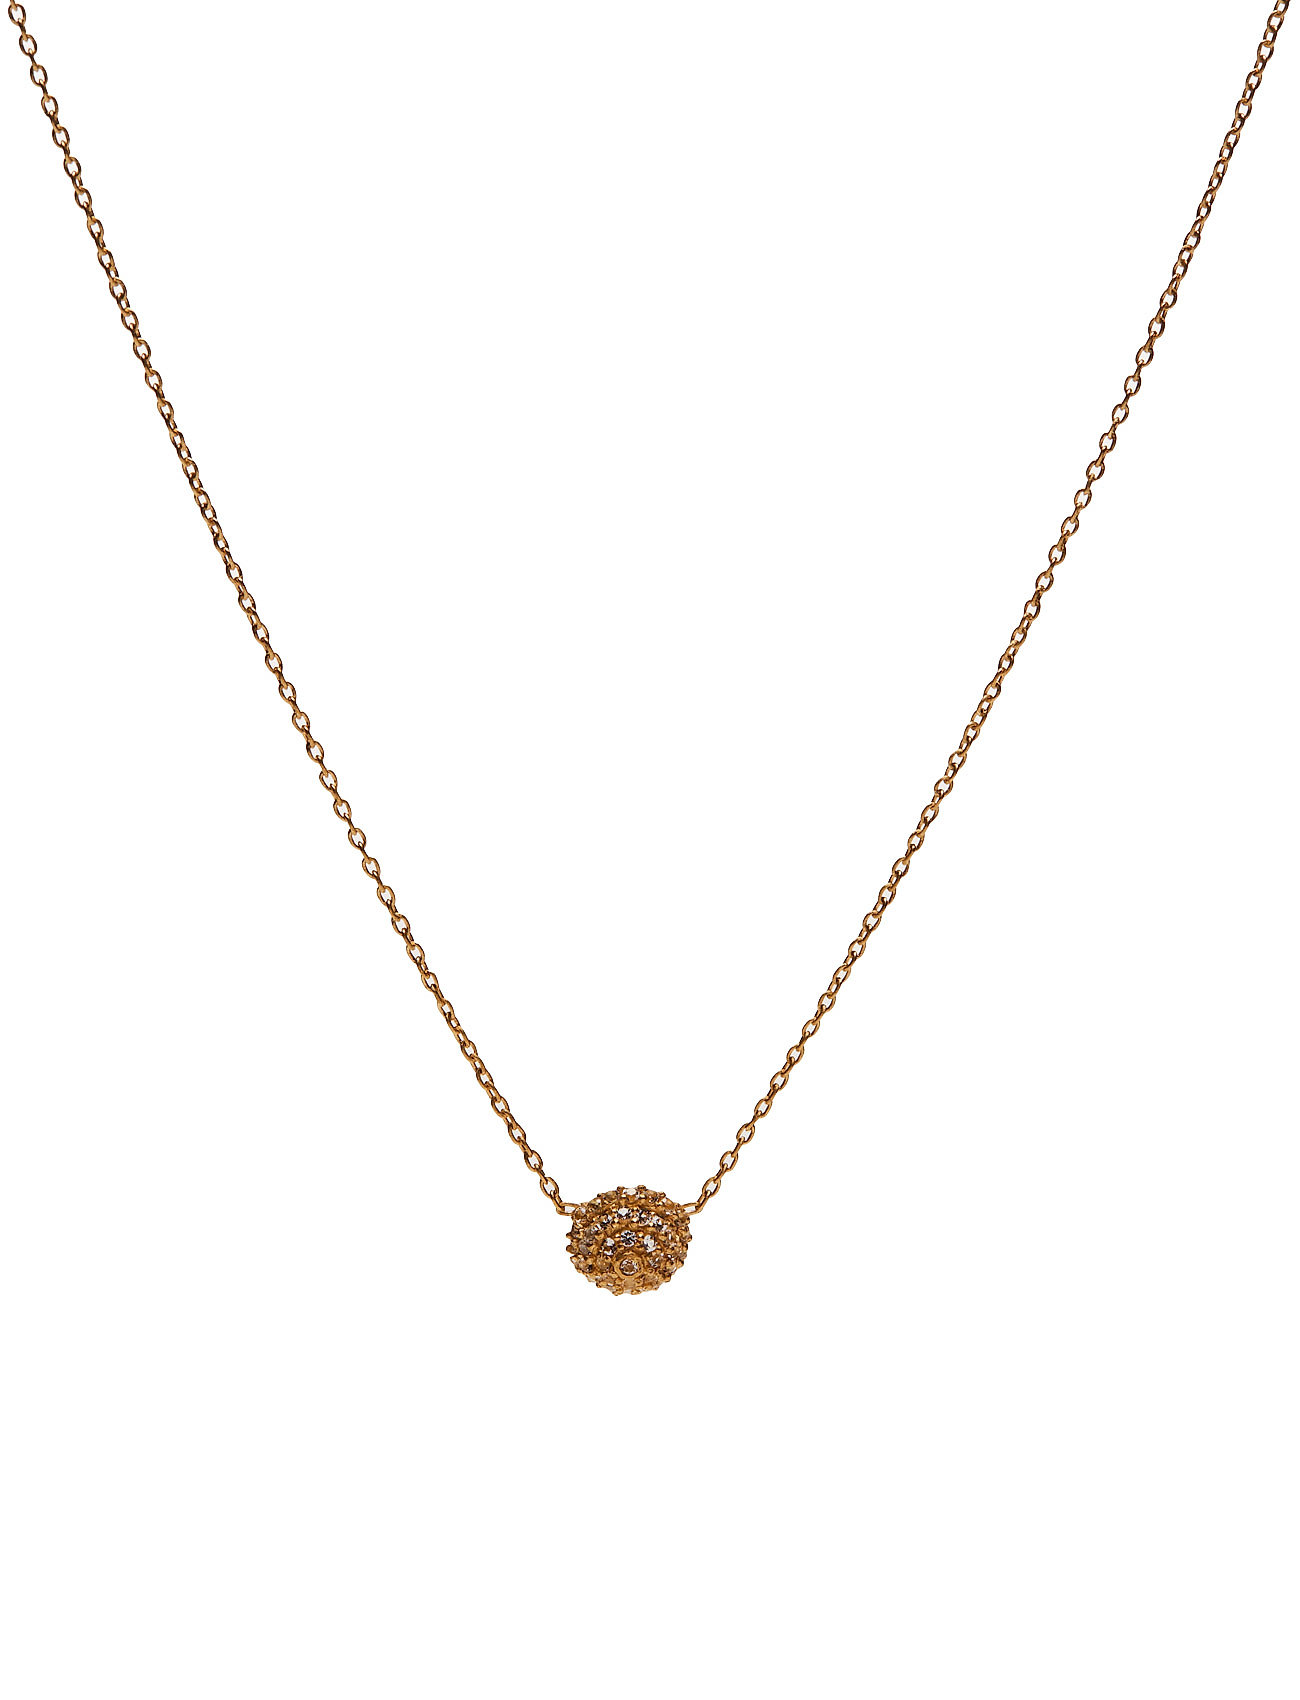 Spotlight Necklace - Jewlscph